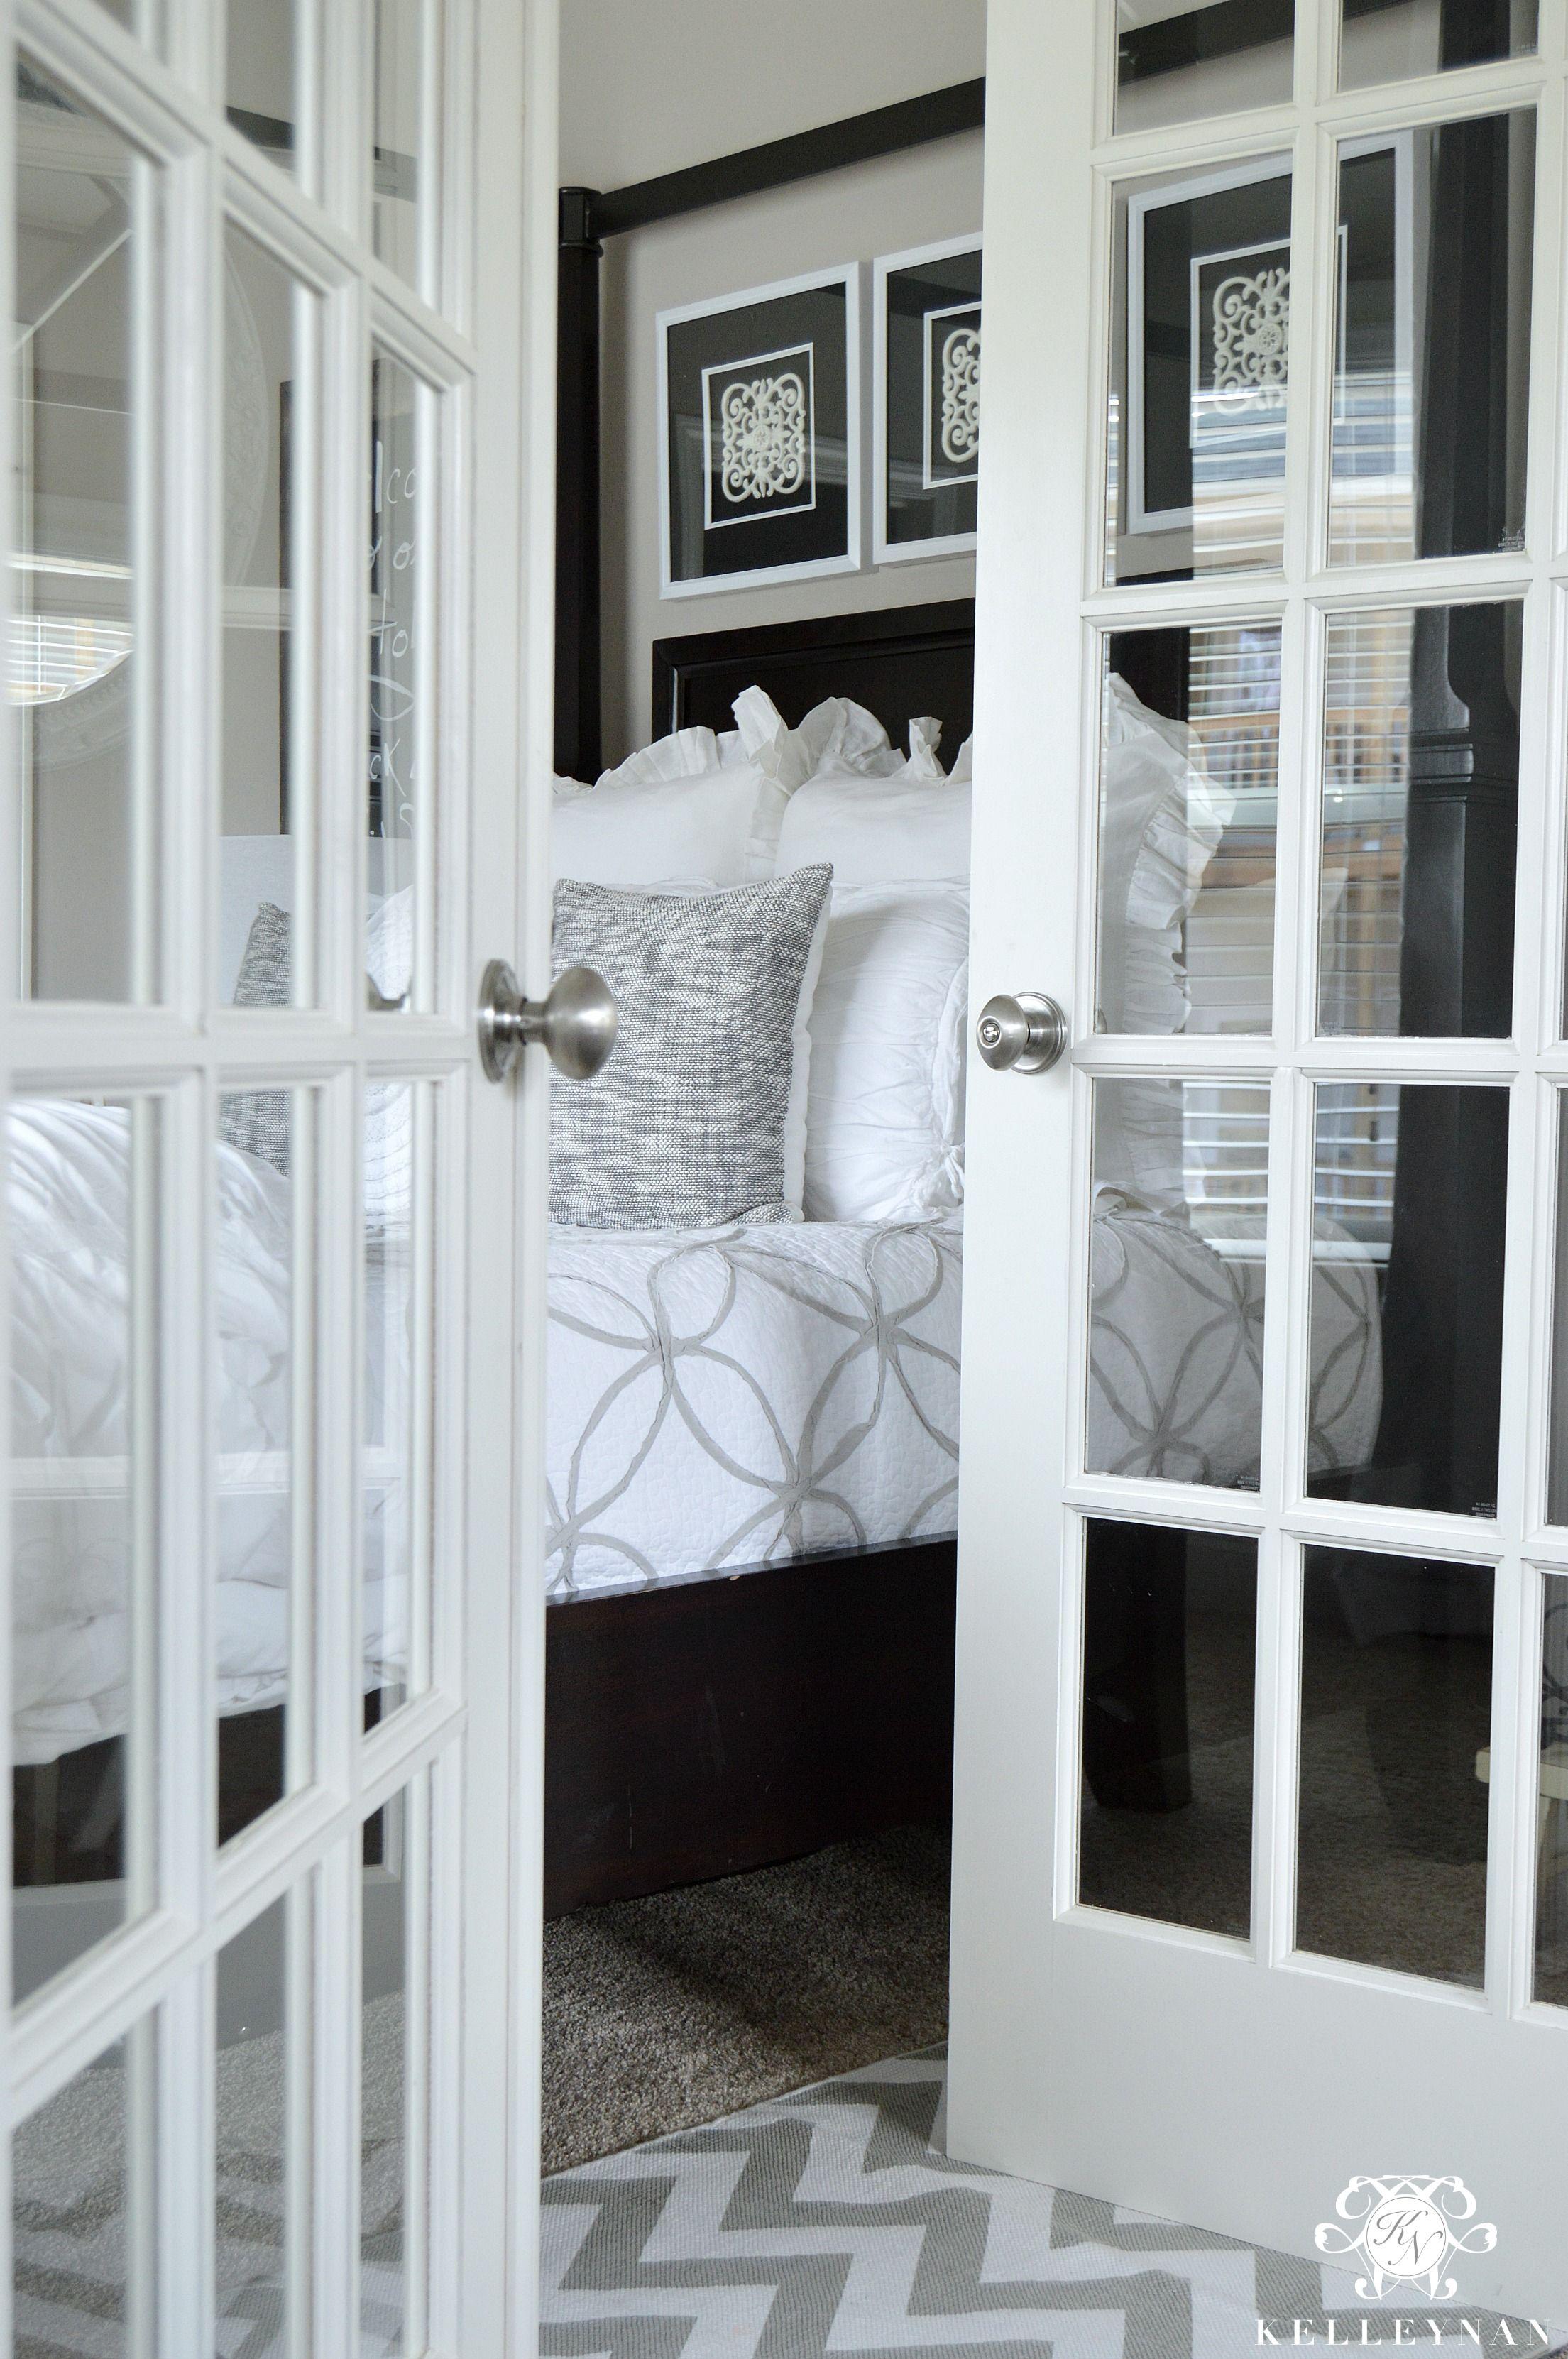 Master bedroom door design  Survey Room Makeover FaceOff  Room Bedrooms and Loft apartment